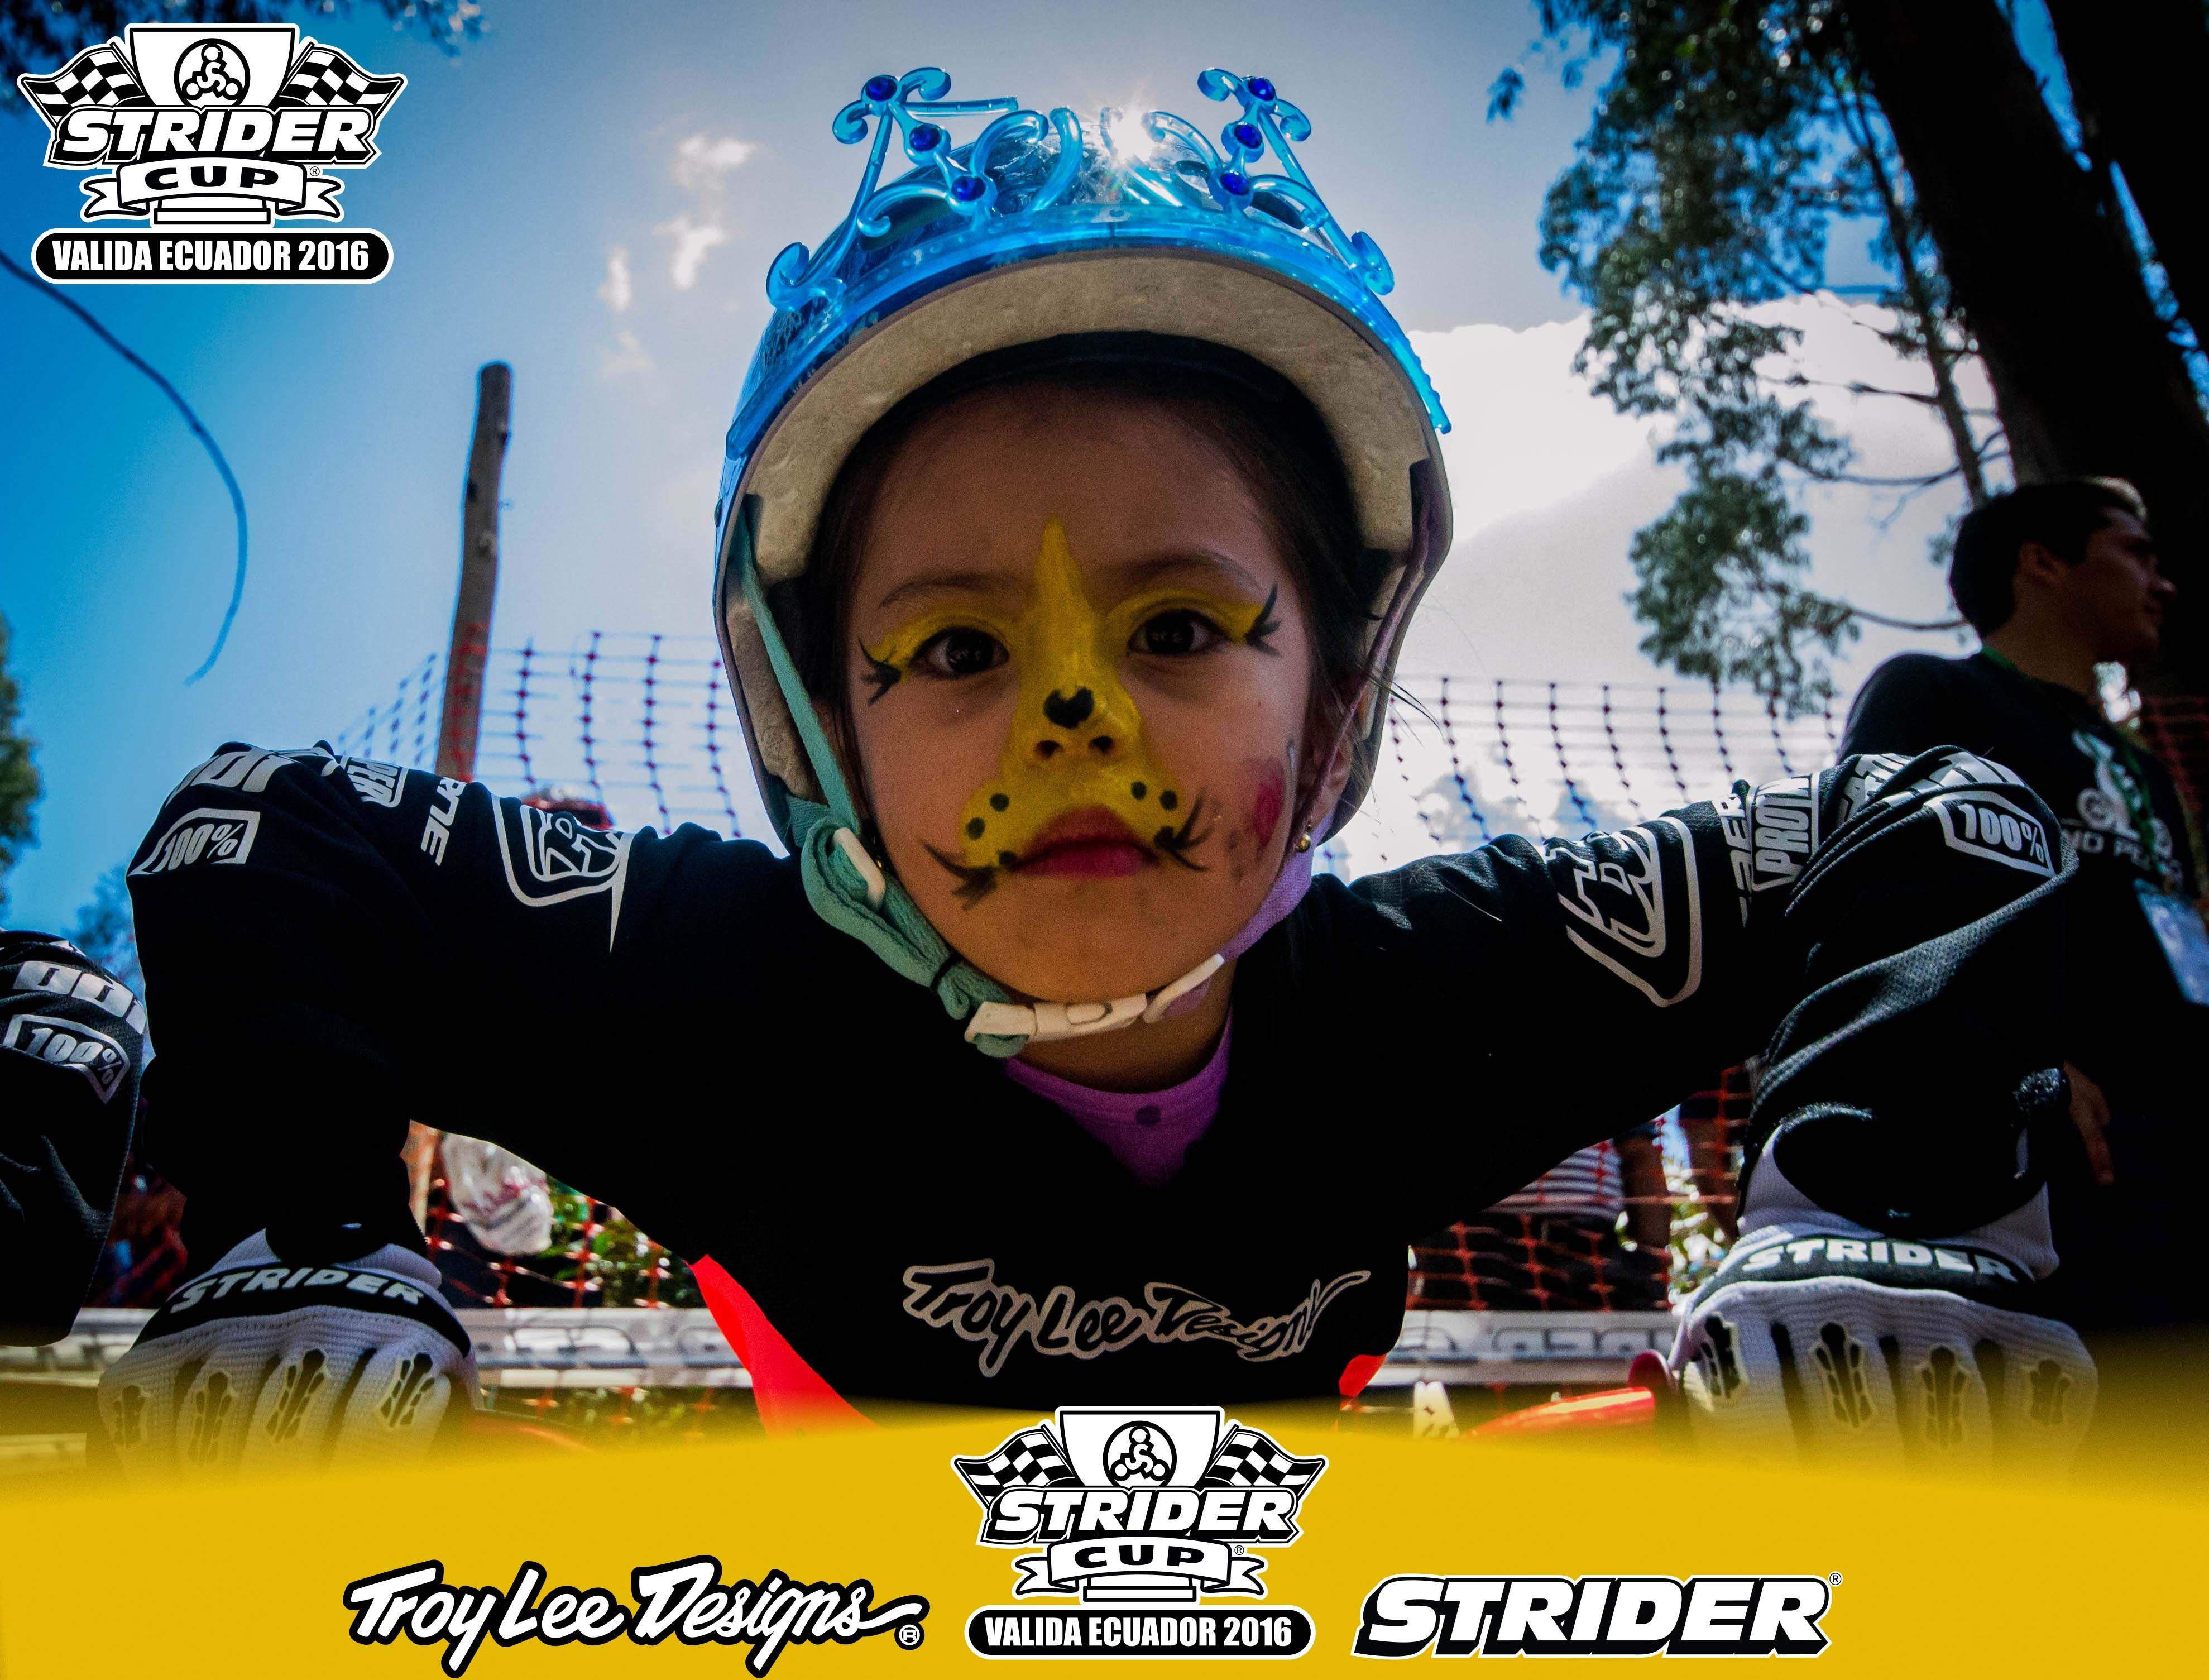 2016 Strider Cup Ecuador racing fun!